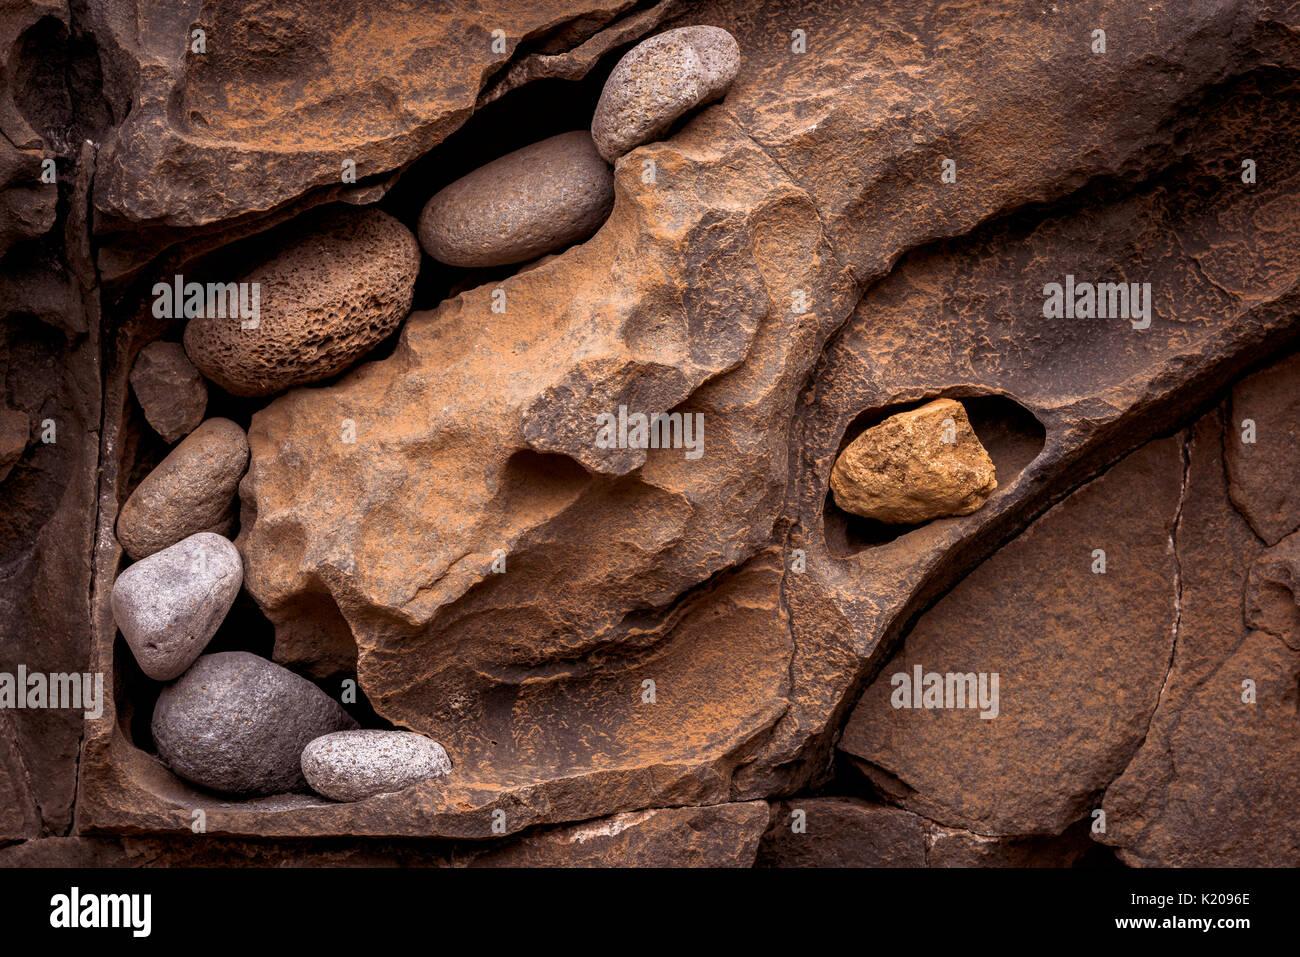 Stone deposit on rock wall, Ribera de Janela, Madeira, Portugal - Stock Image